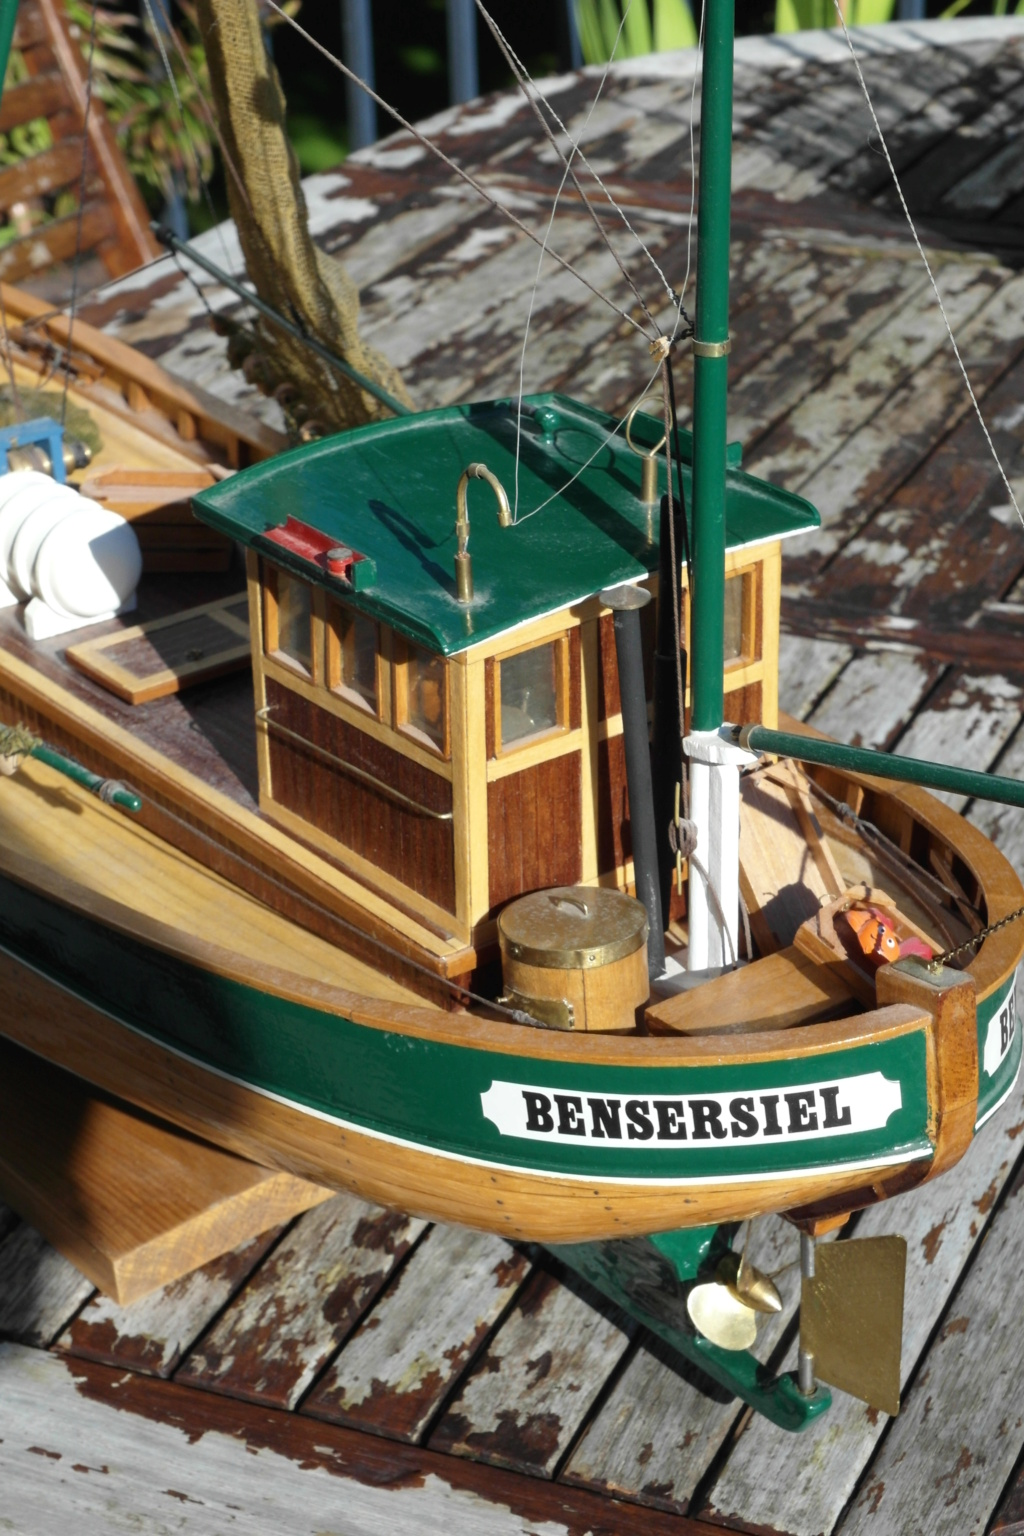 Bensersiel - BEN 10 Sam_0067